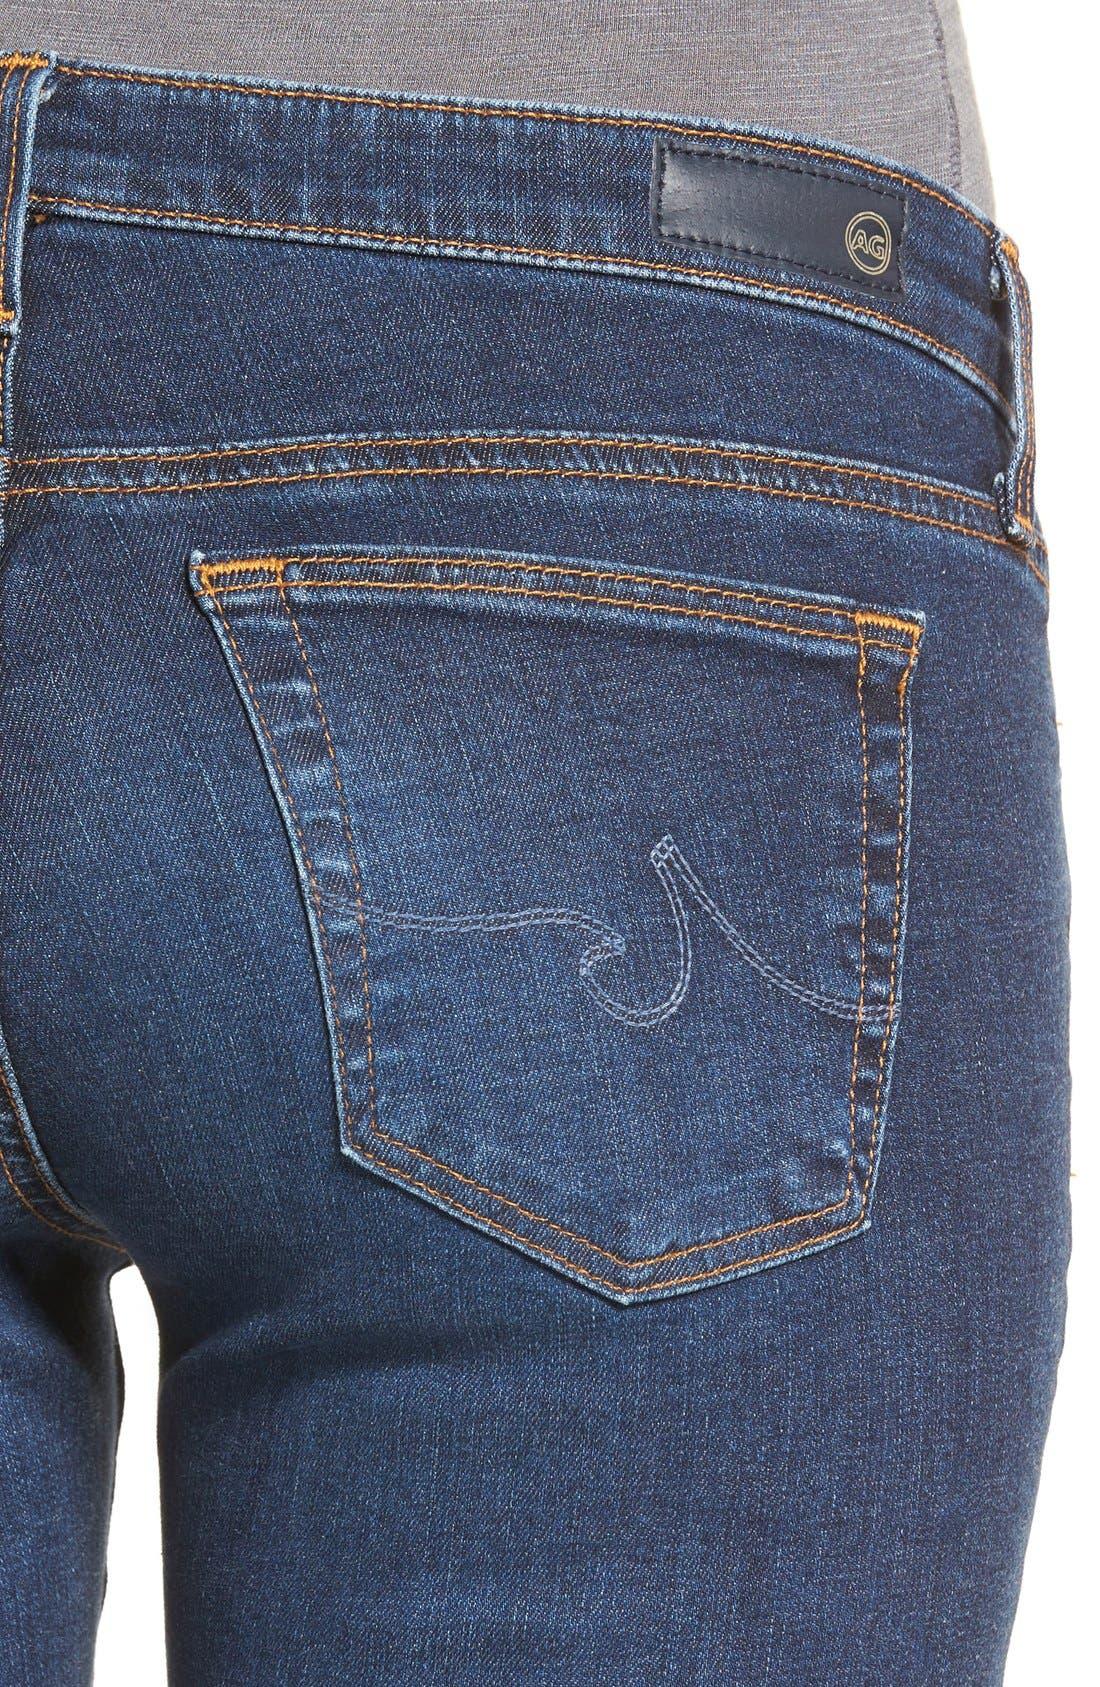 'The Legging' Super Skinny Jeans,                             Alternate thumbnail 20, color,